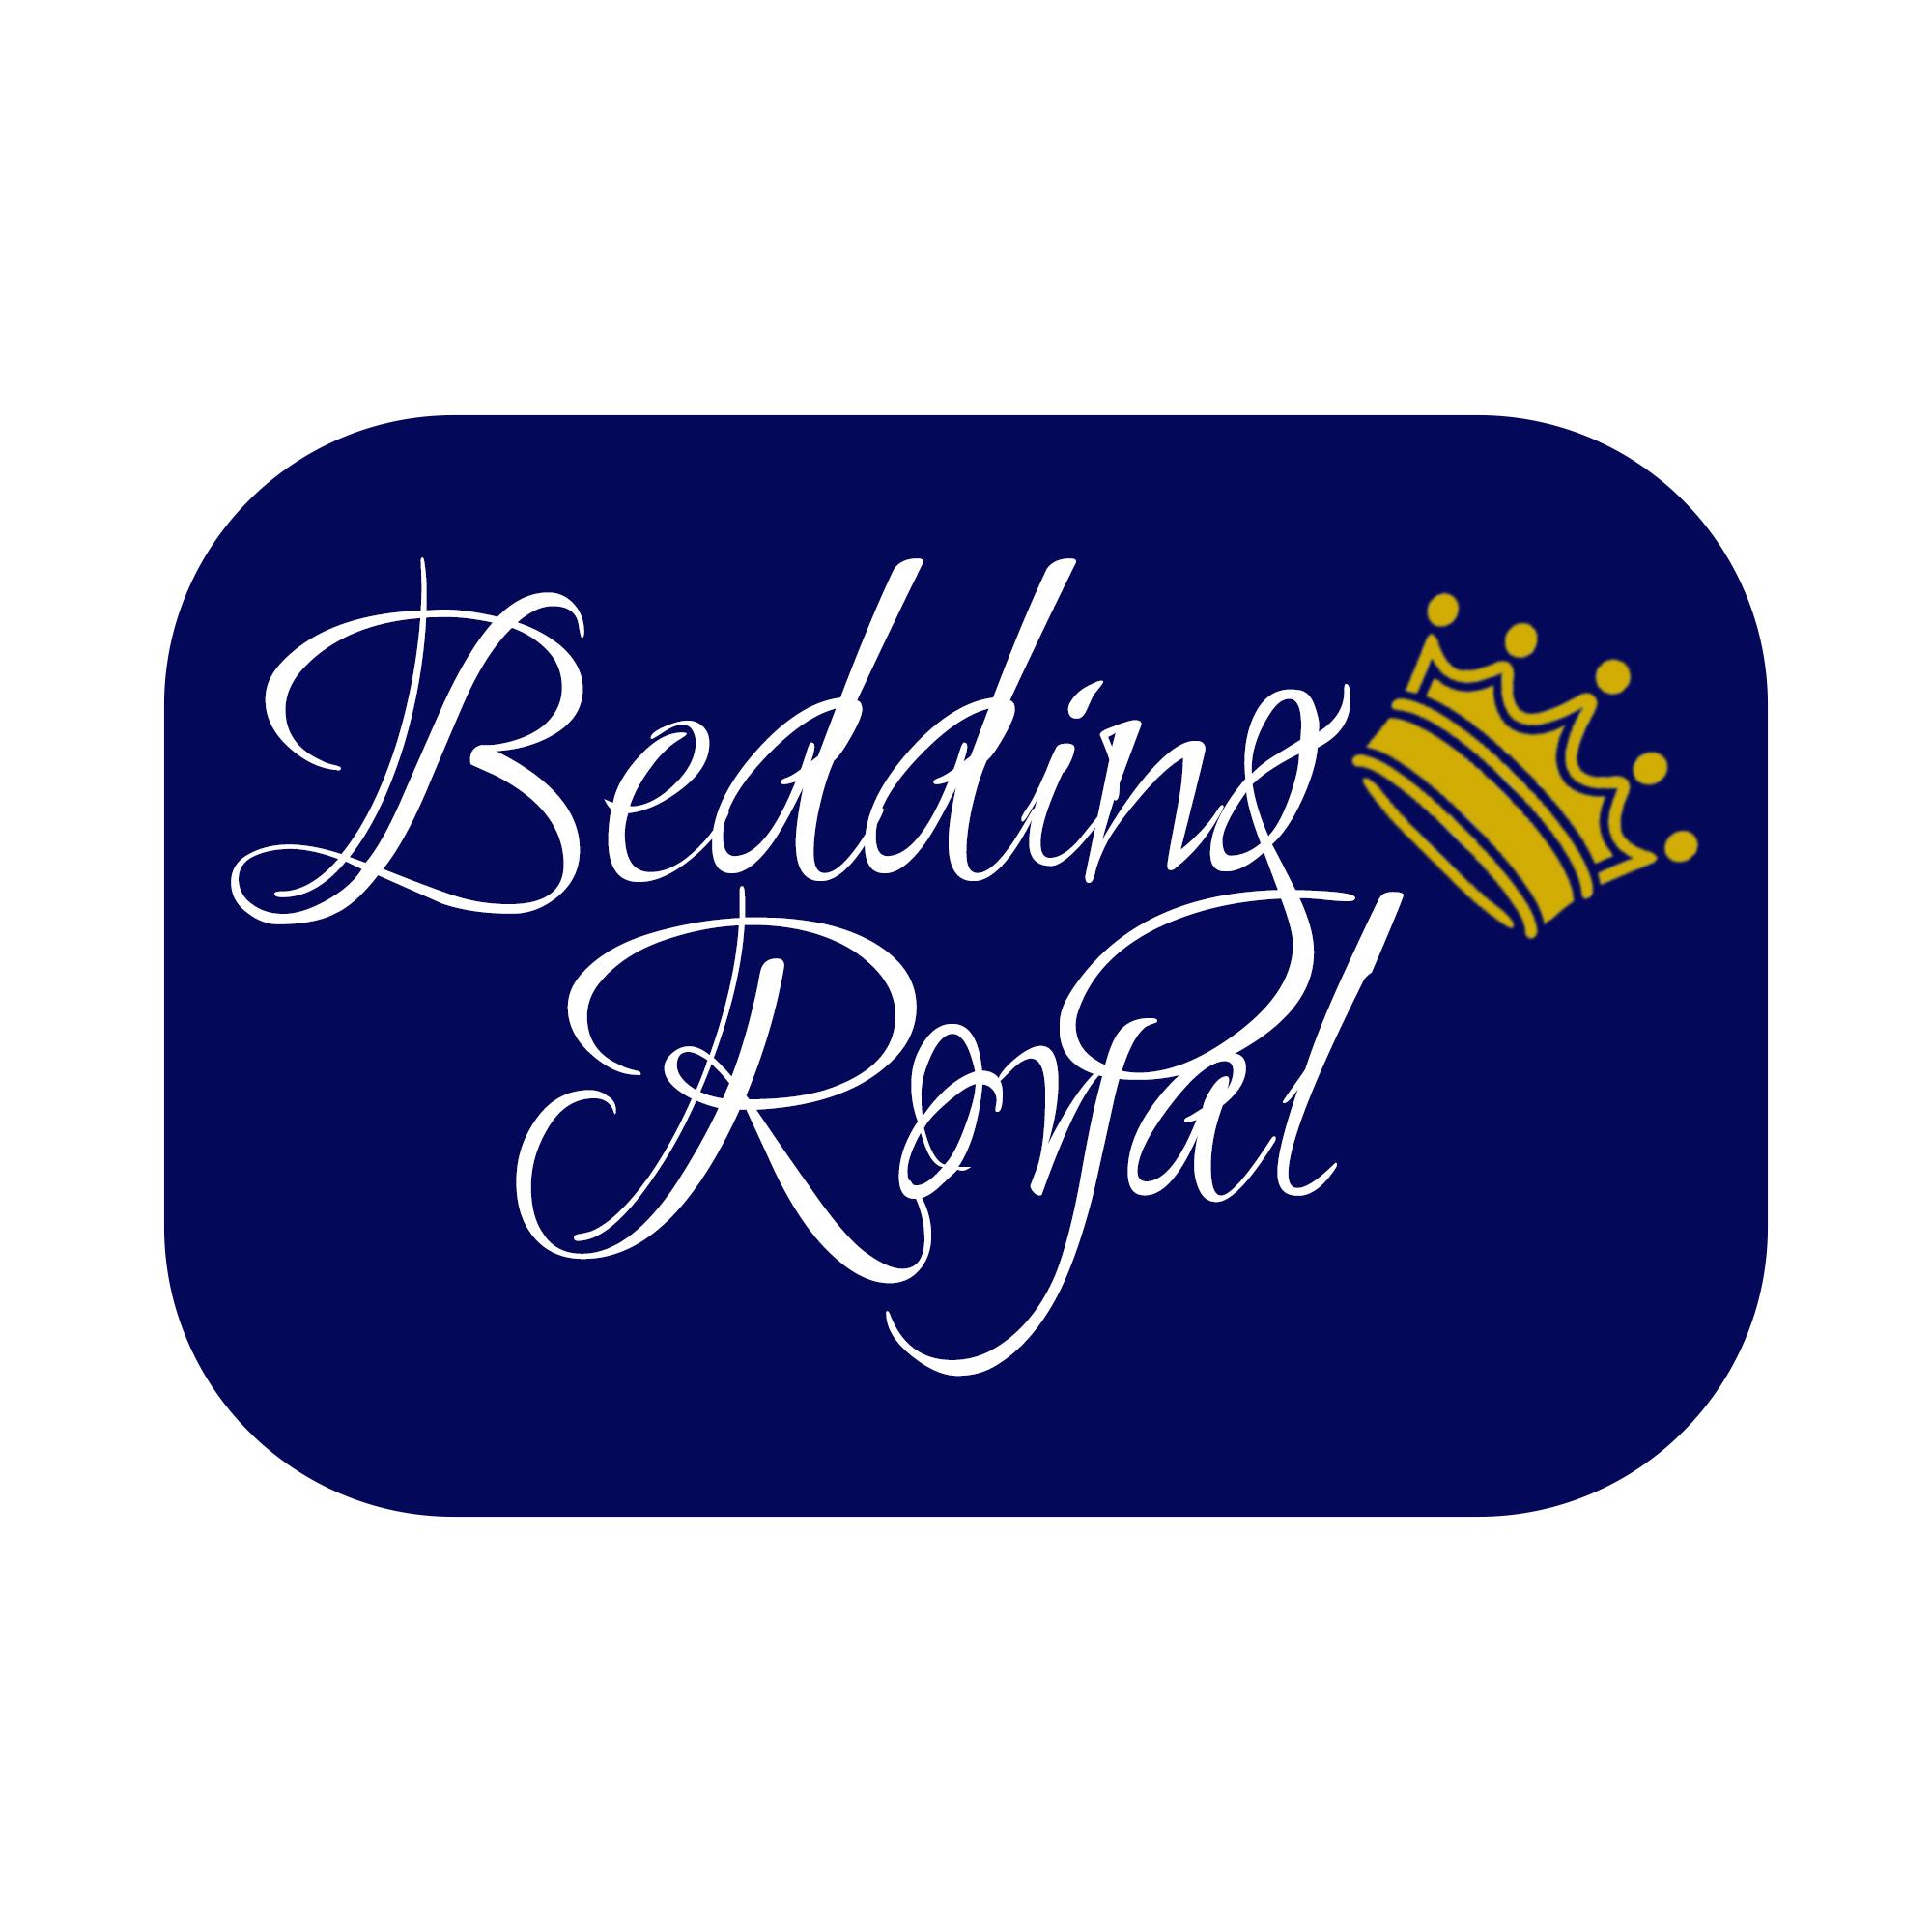 Bedding Royal